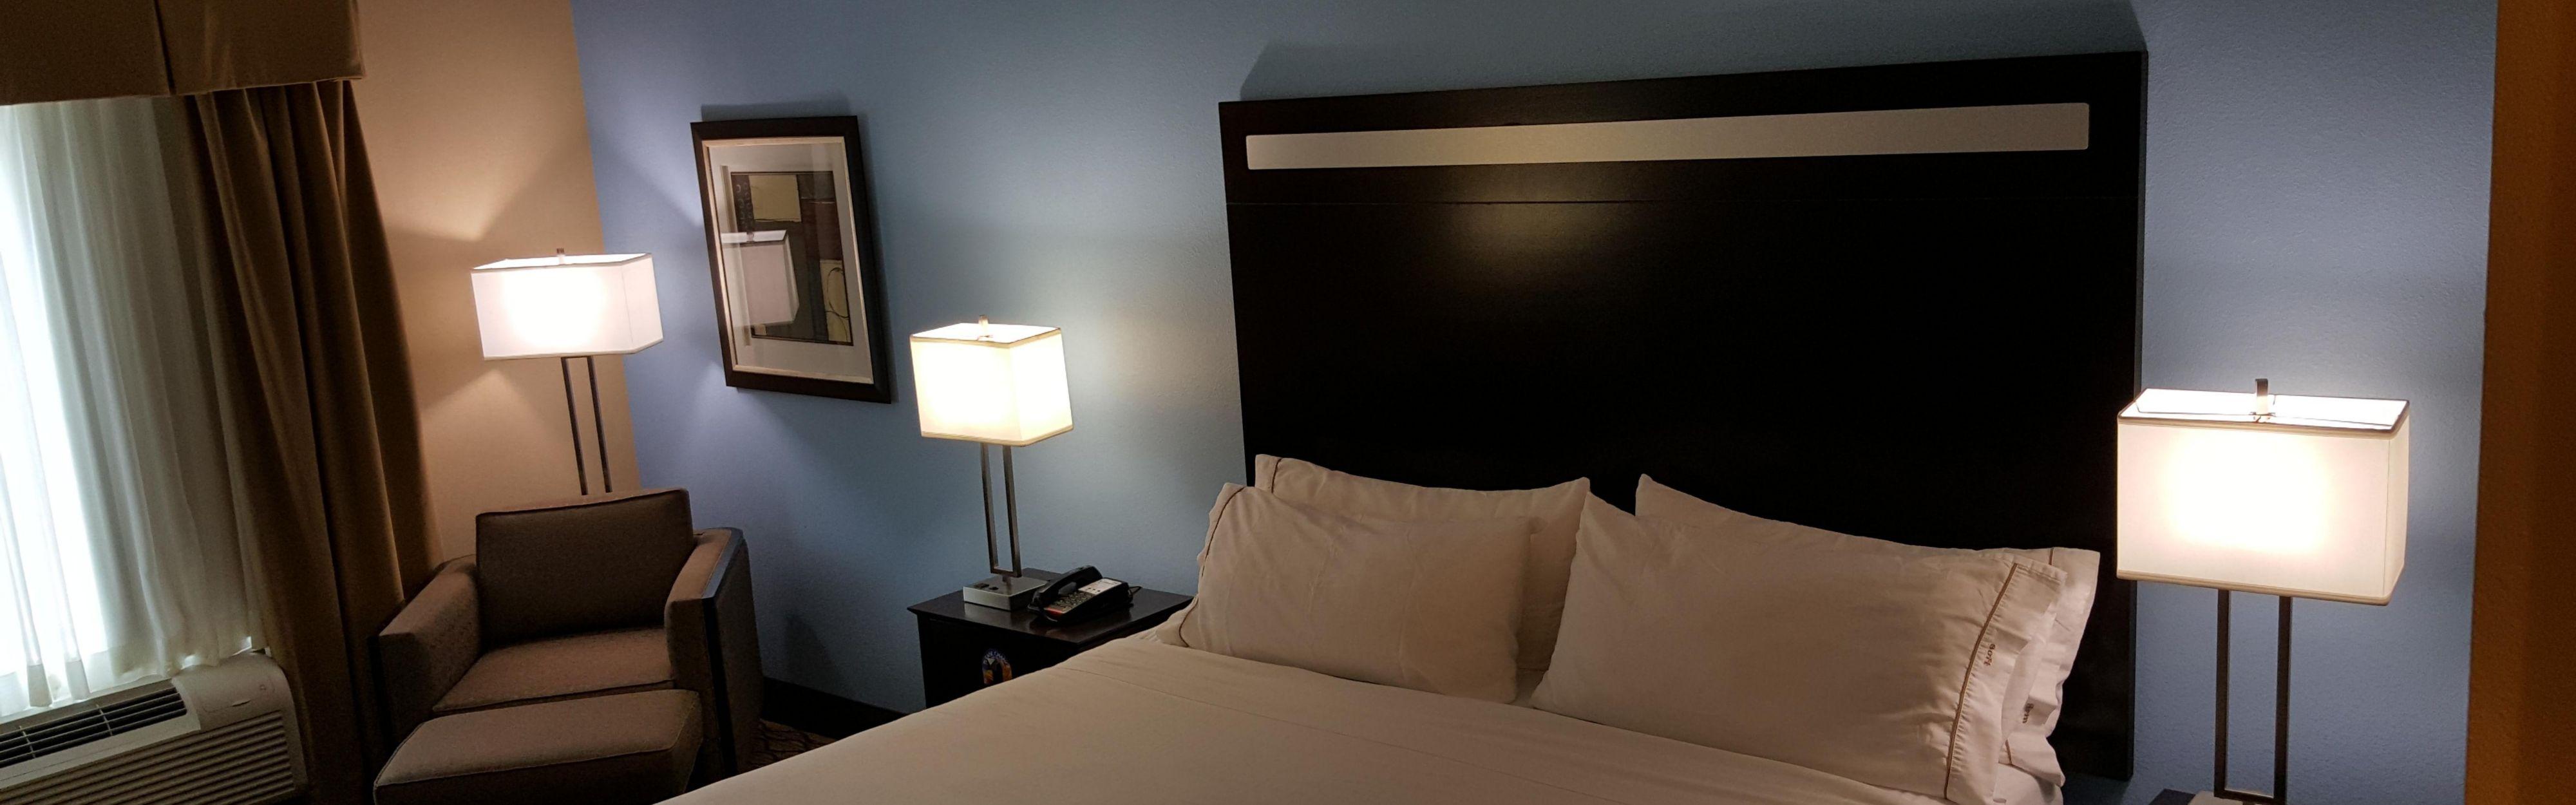 Holiday Inn Express & Suites Atascocita - Humble - Kingwood image 1